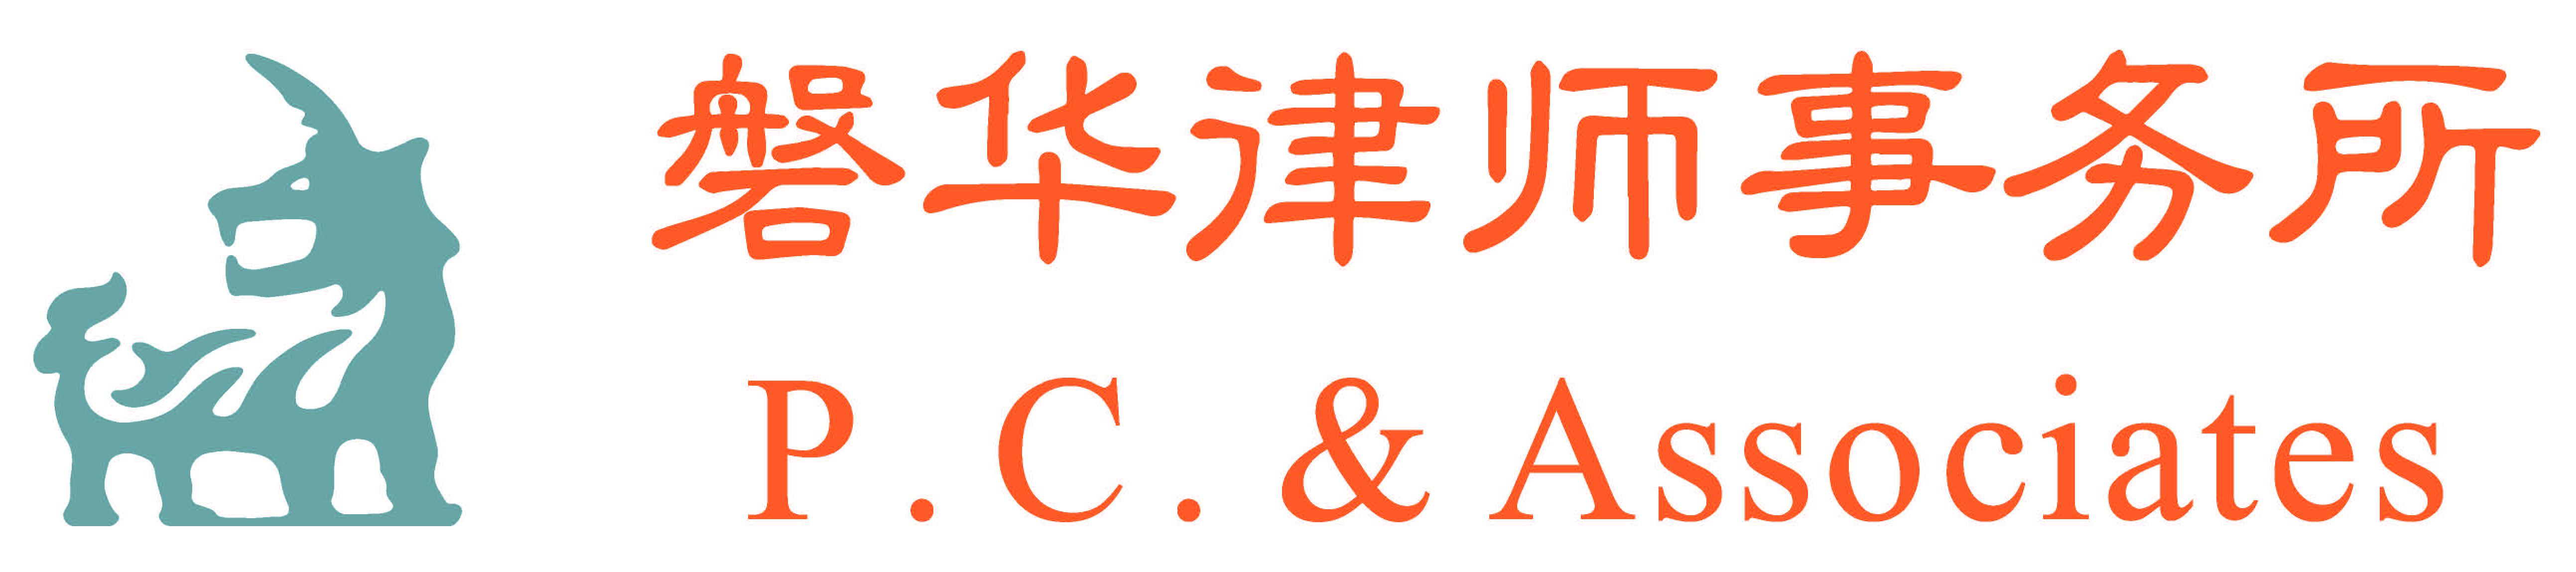 PC & Associates